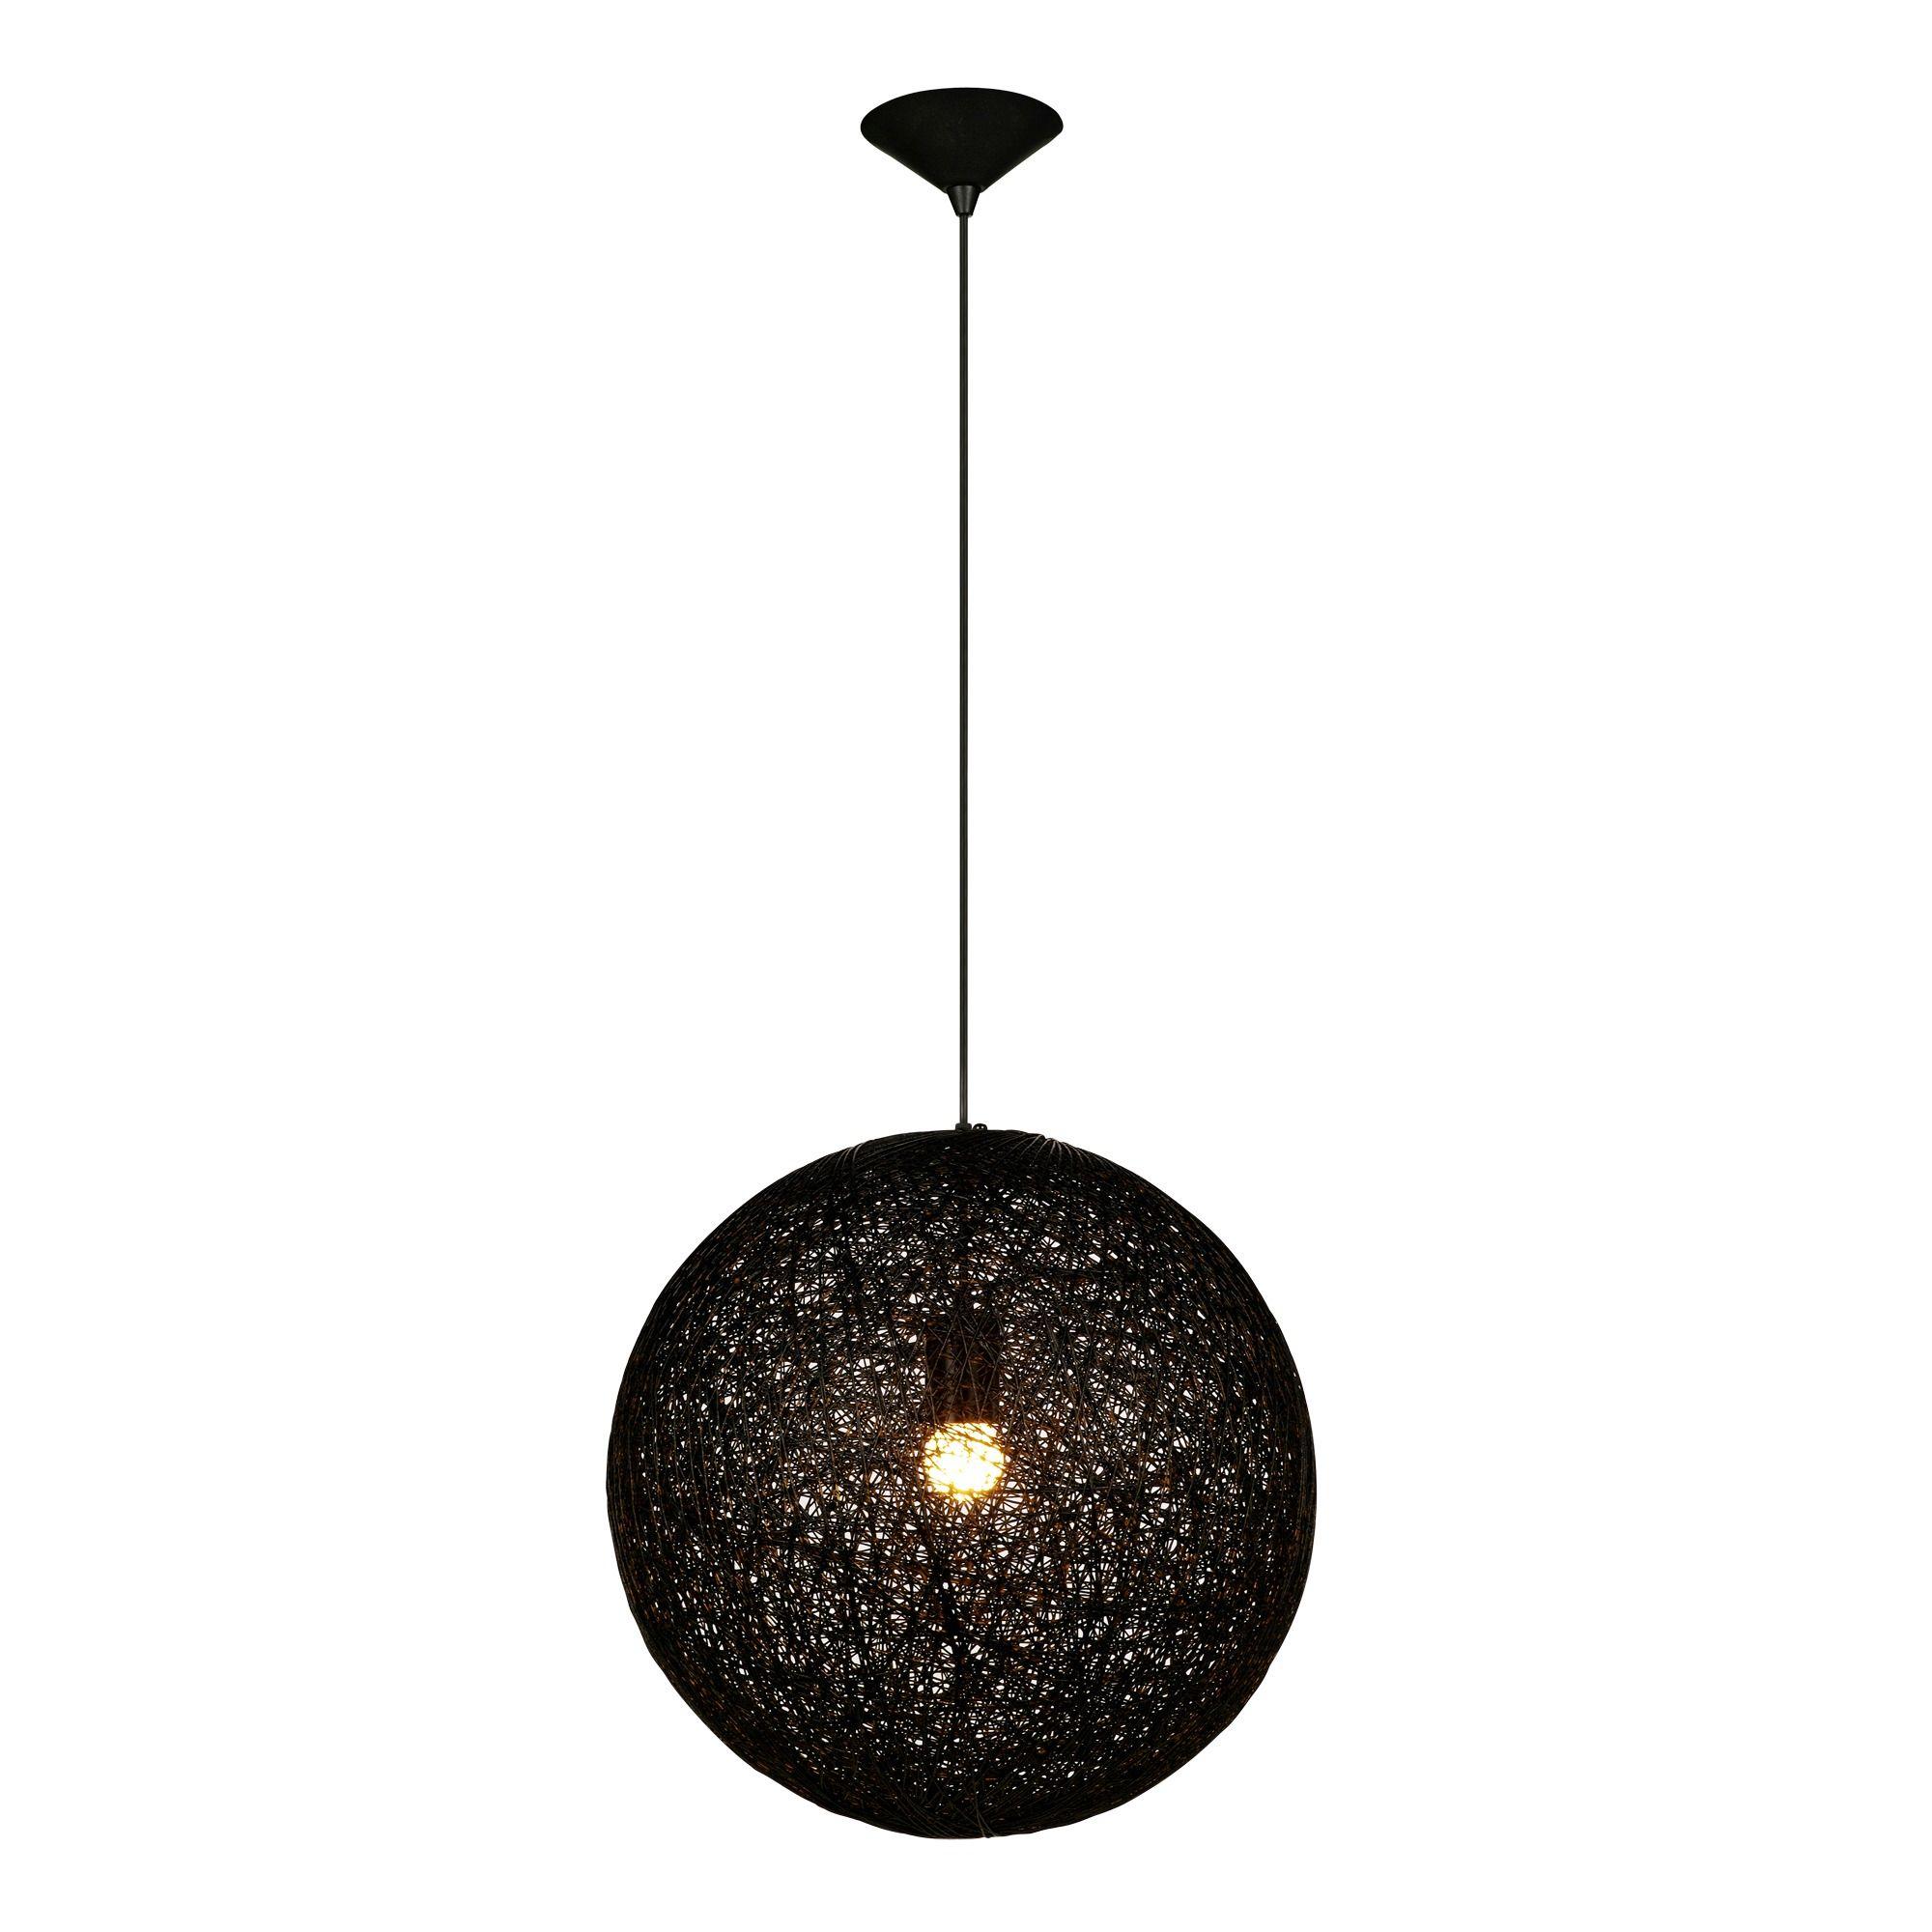 GAMMA Mirthe hanglamp diameter 40cm | Home decoration ideas | Pinterest